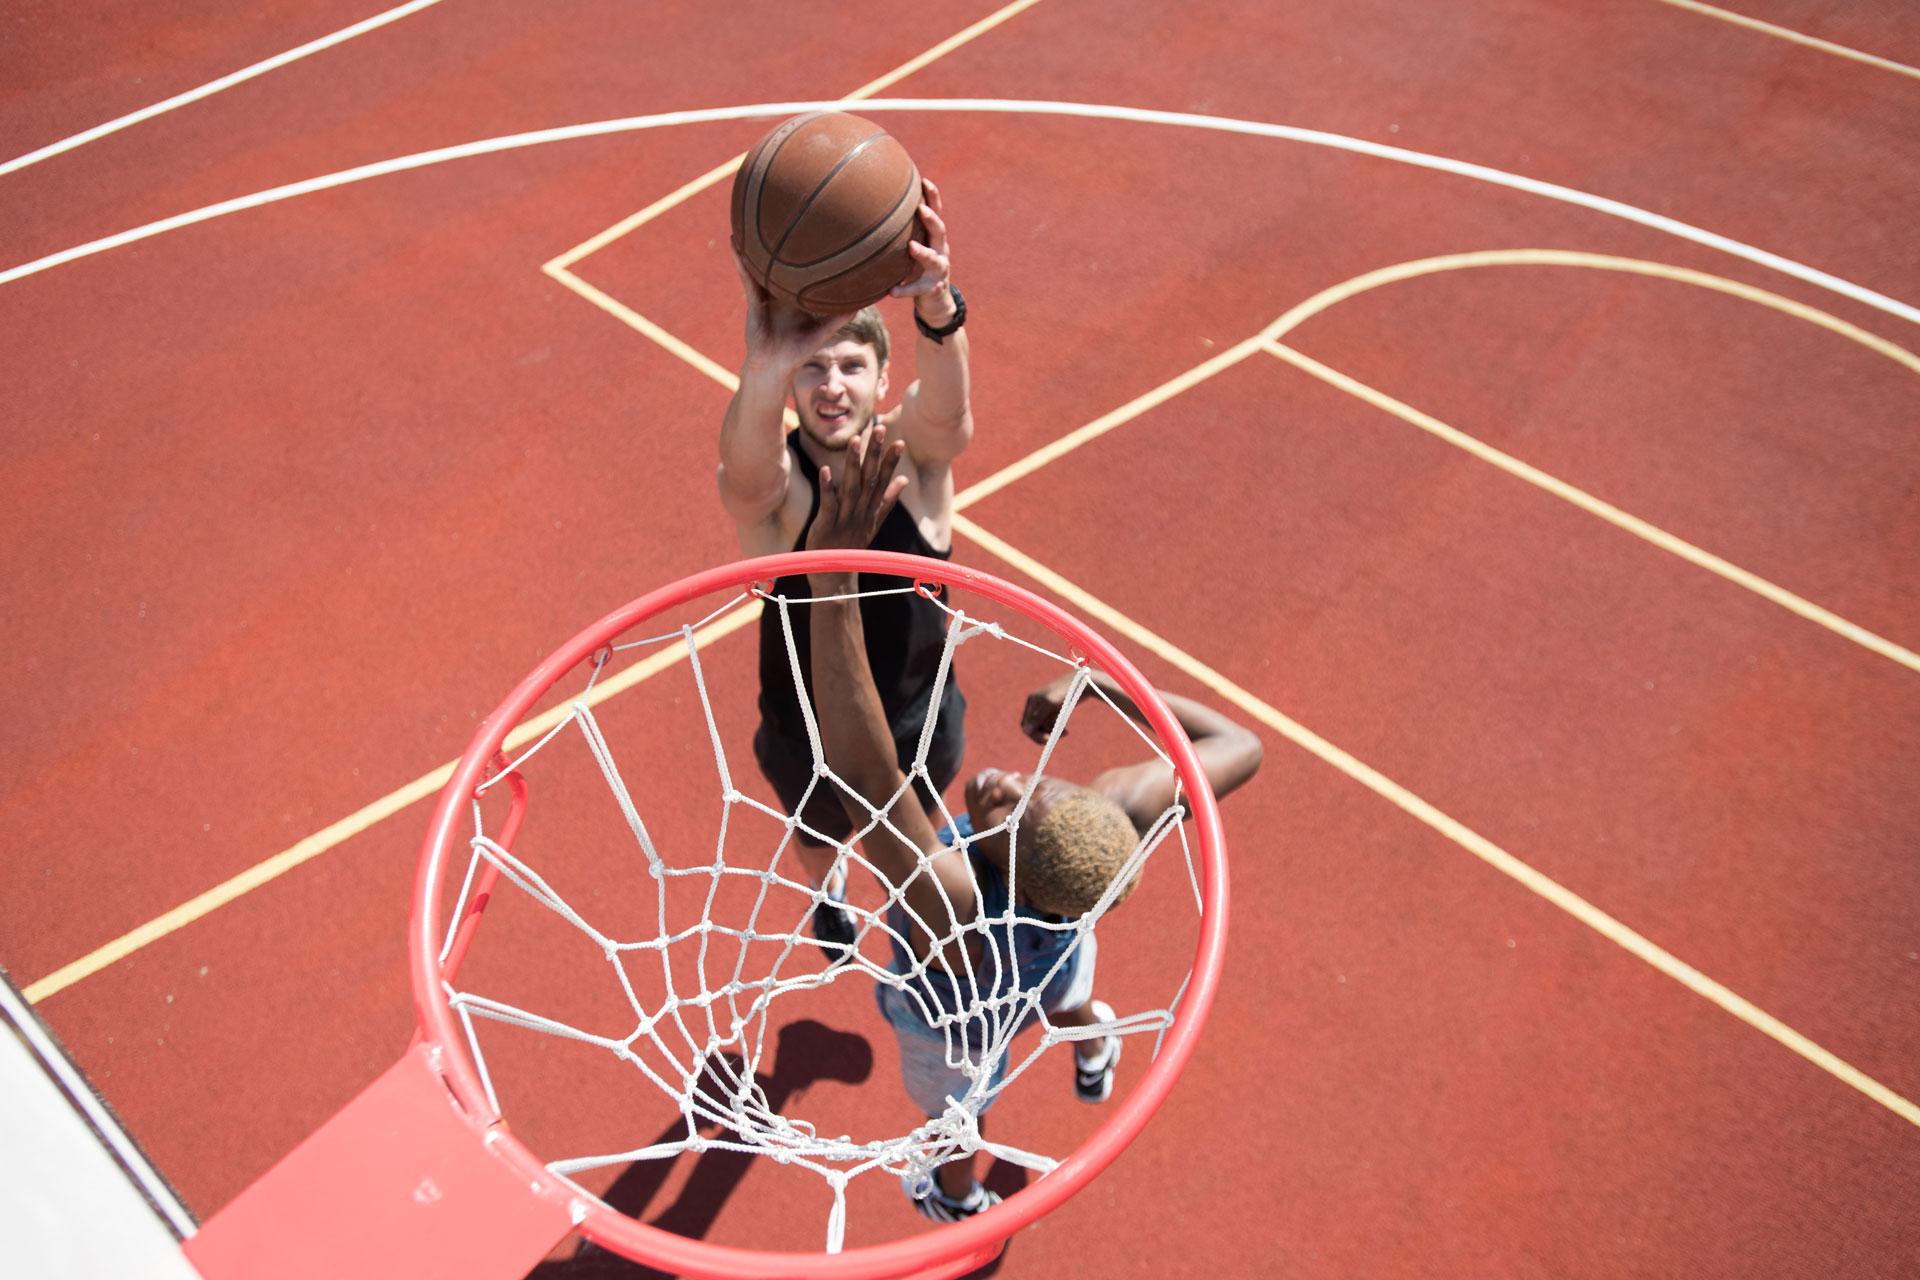 Angebotsbild-Basketball